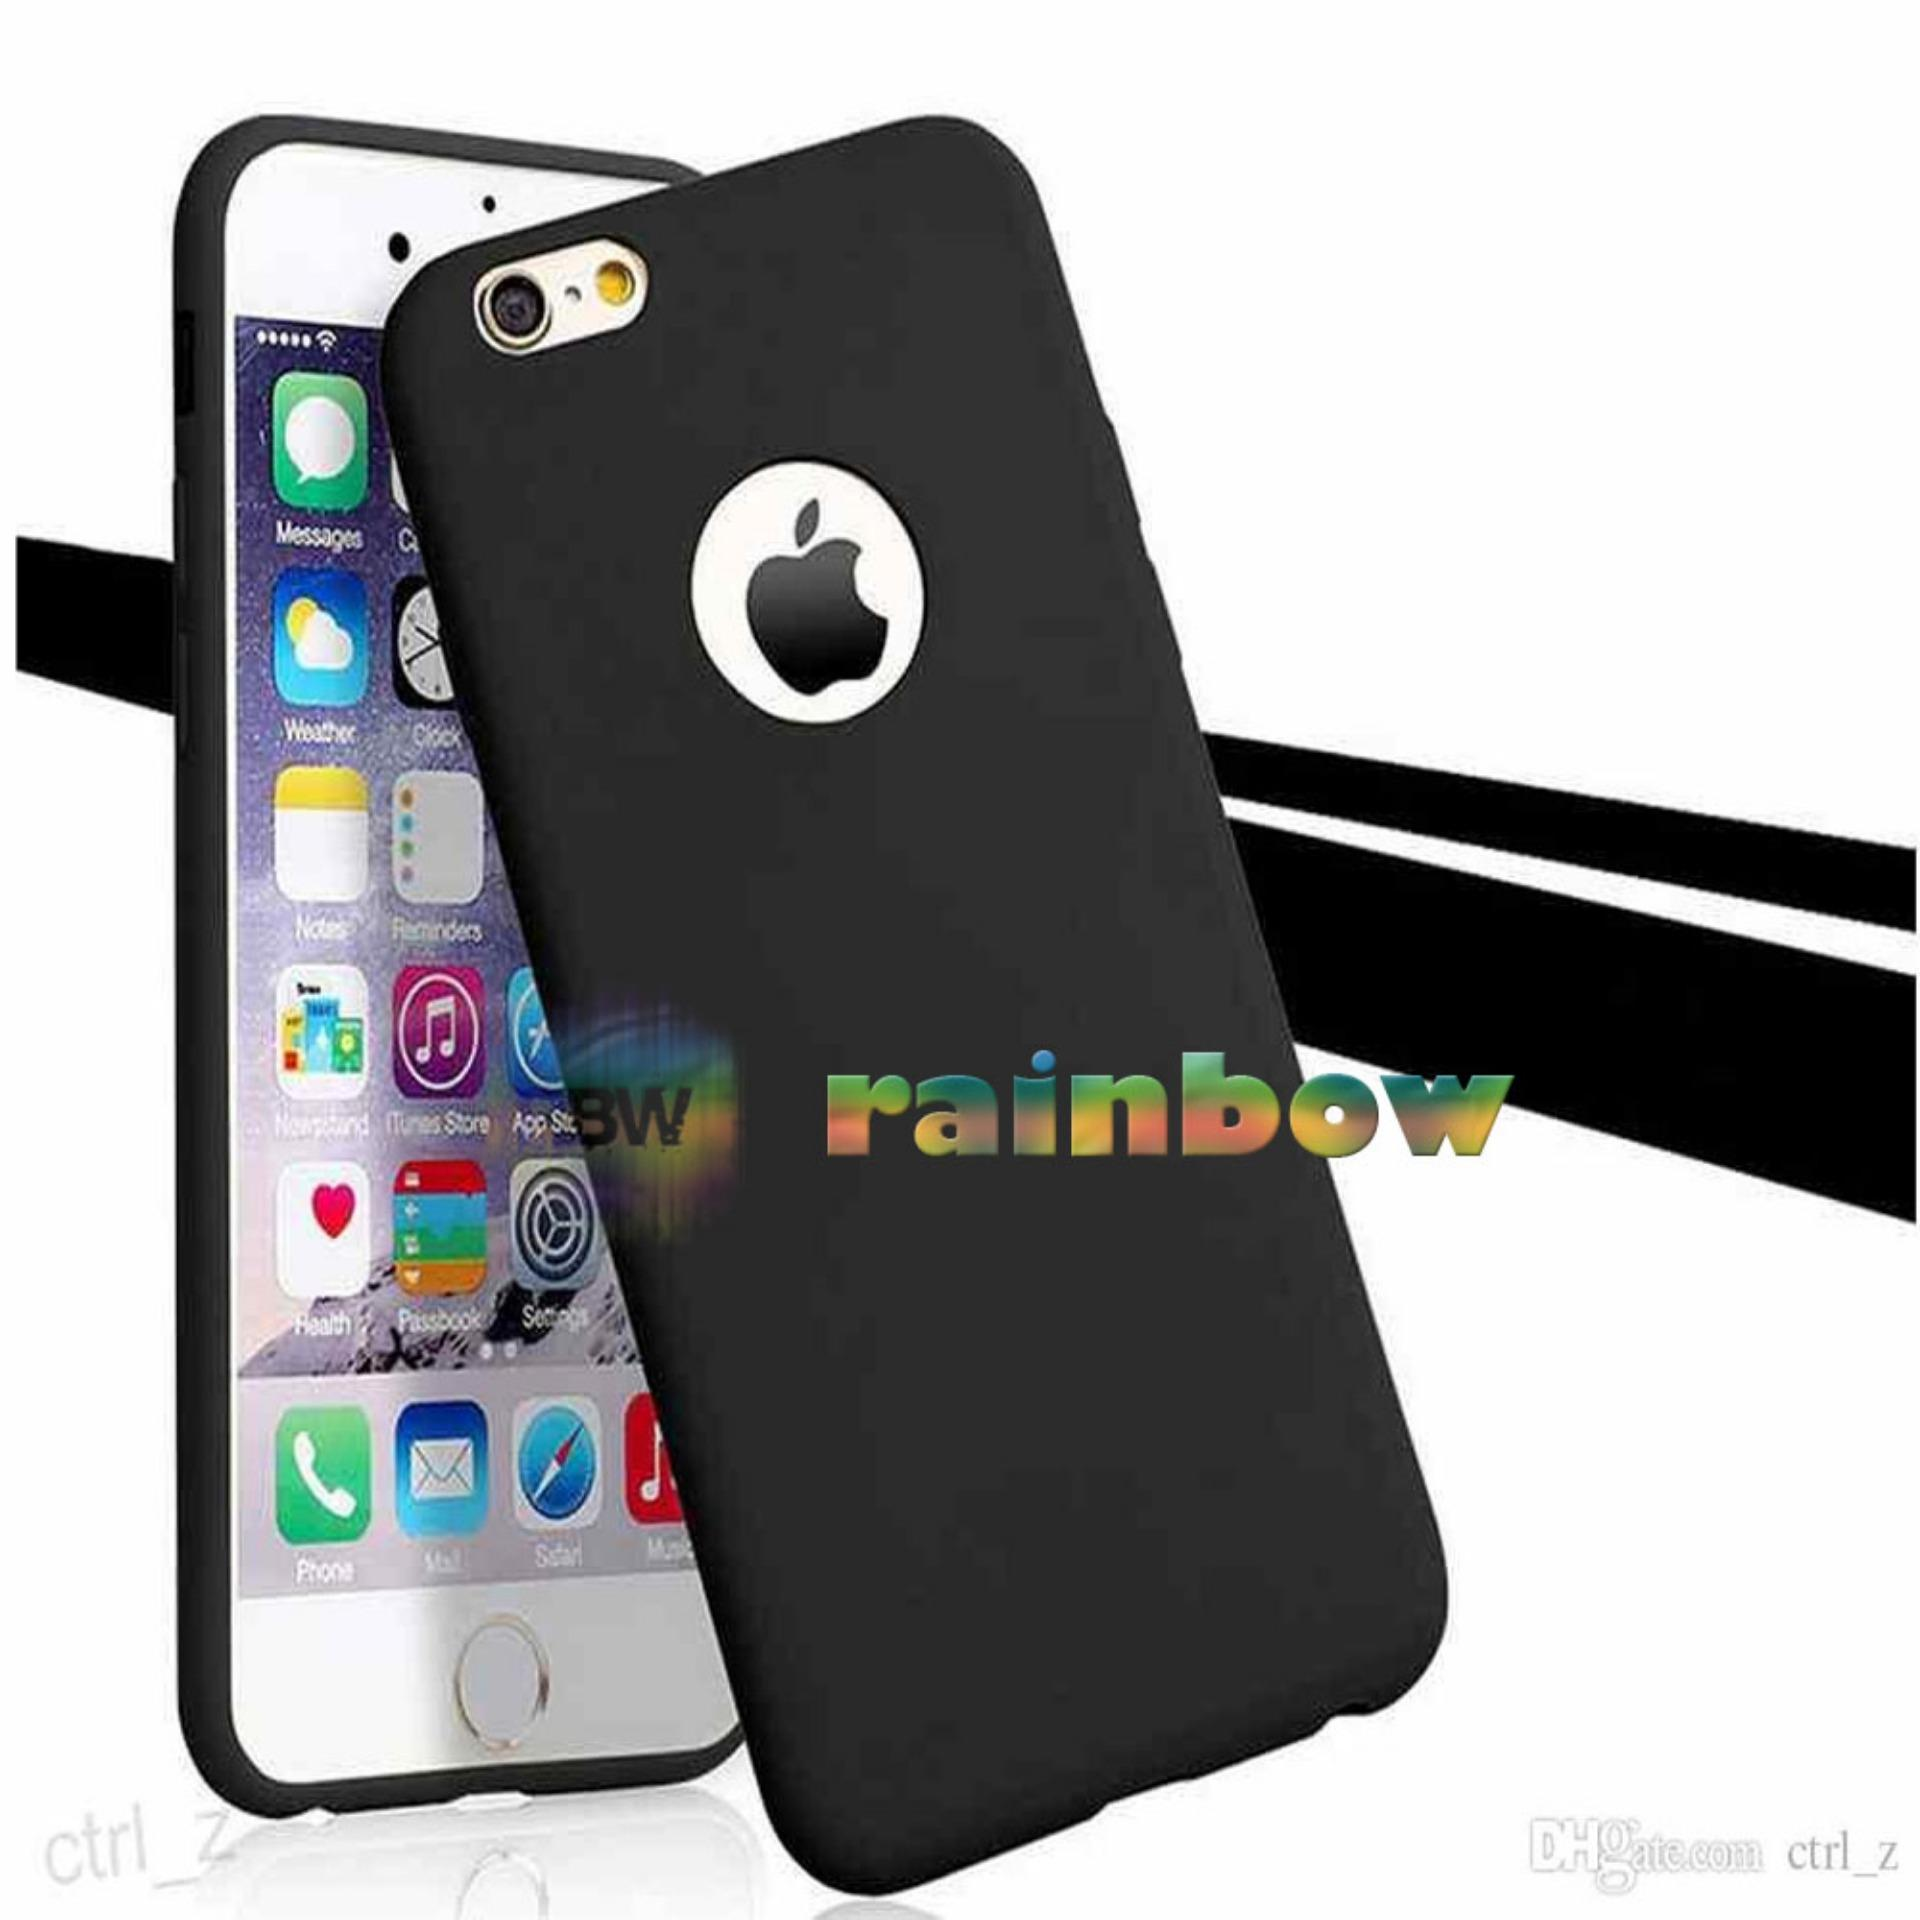 accessories-hp-anti-spy-tempered-glass-premium-screen-protector-privacy-for-iphone-6-plus-6s-plus-3841-58877009-9fce738d4af92441b112434f66c95d26-catalog_233 Daftar Harga Hp Iphone 6 Kingcopy Termurah Februari 2019